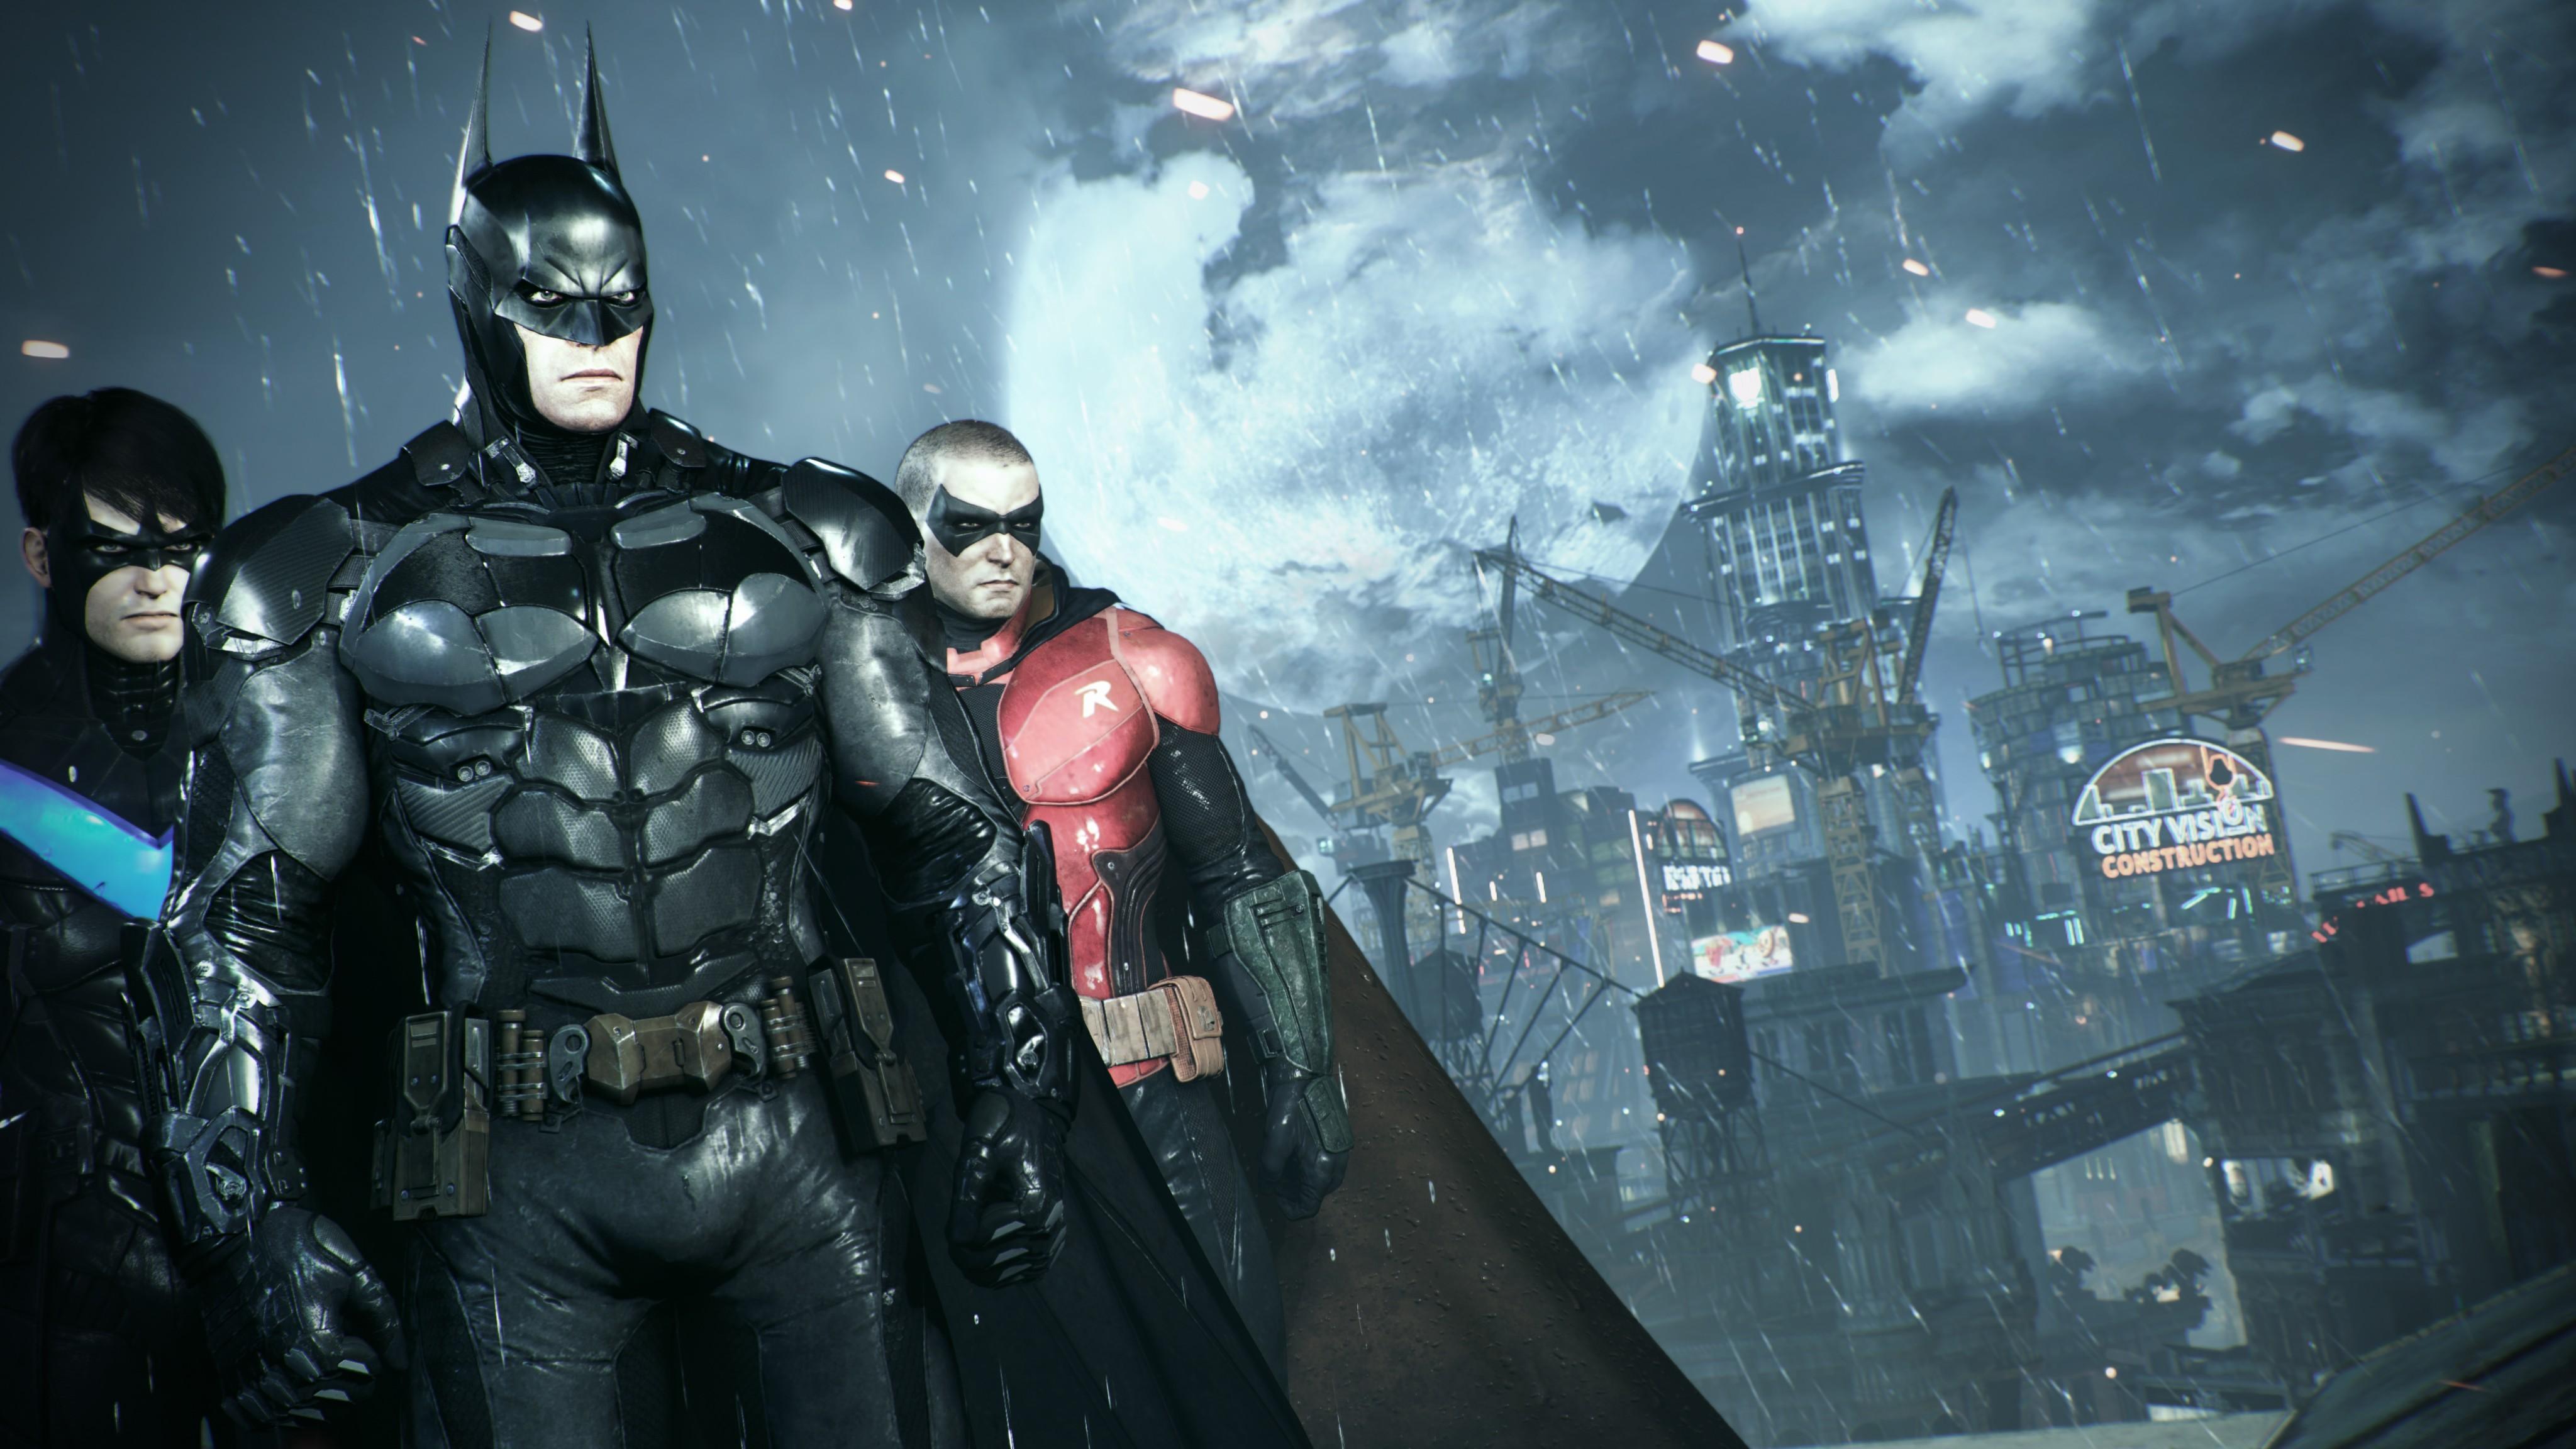 Video Games Batman Arkham Knight Superhero Gotham City Nightwing Robin Character Darkness Screenshot Computer Wallpaper